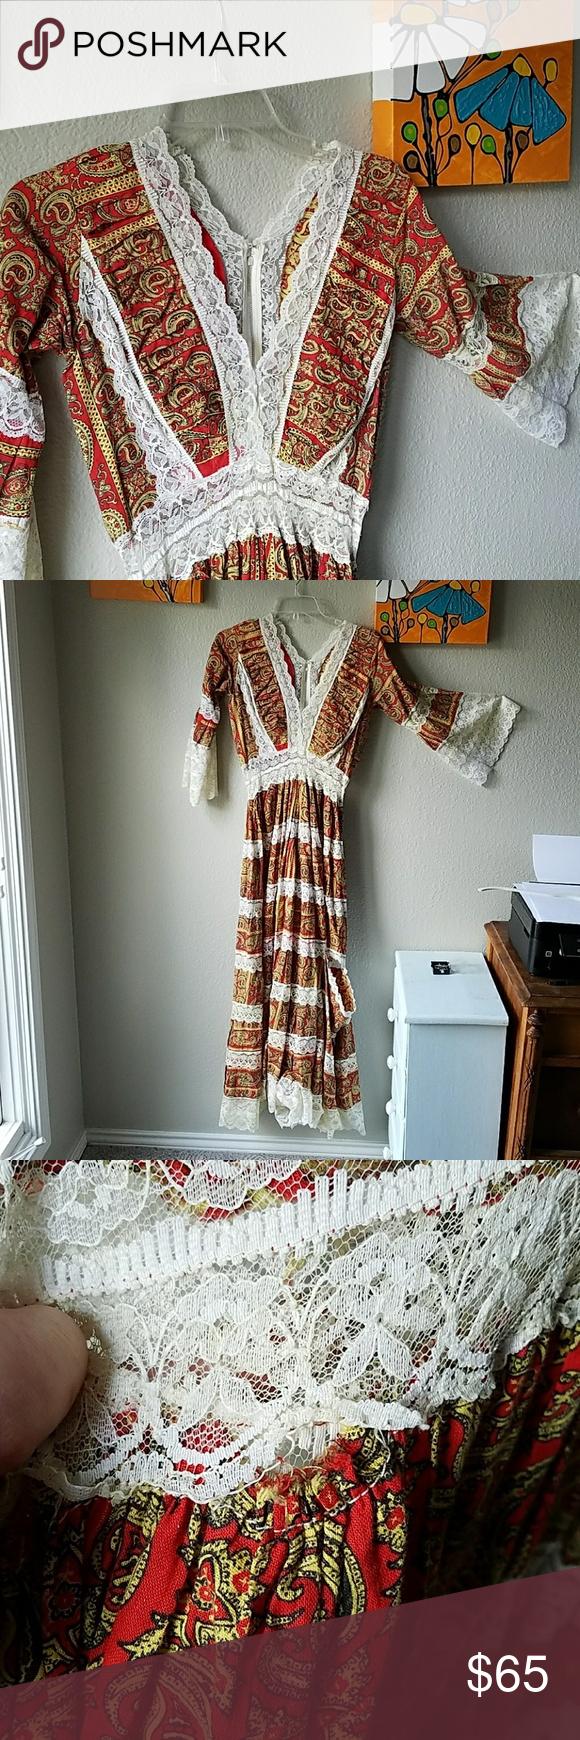 AMAZING boho vintage hippie maxi dress sz 2 lace Hippie